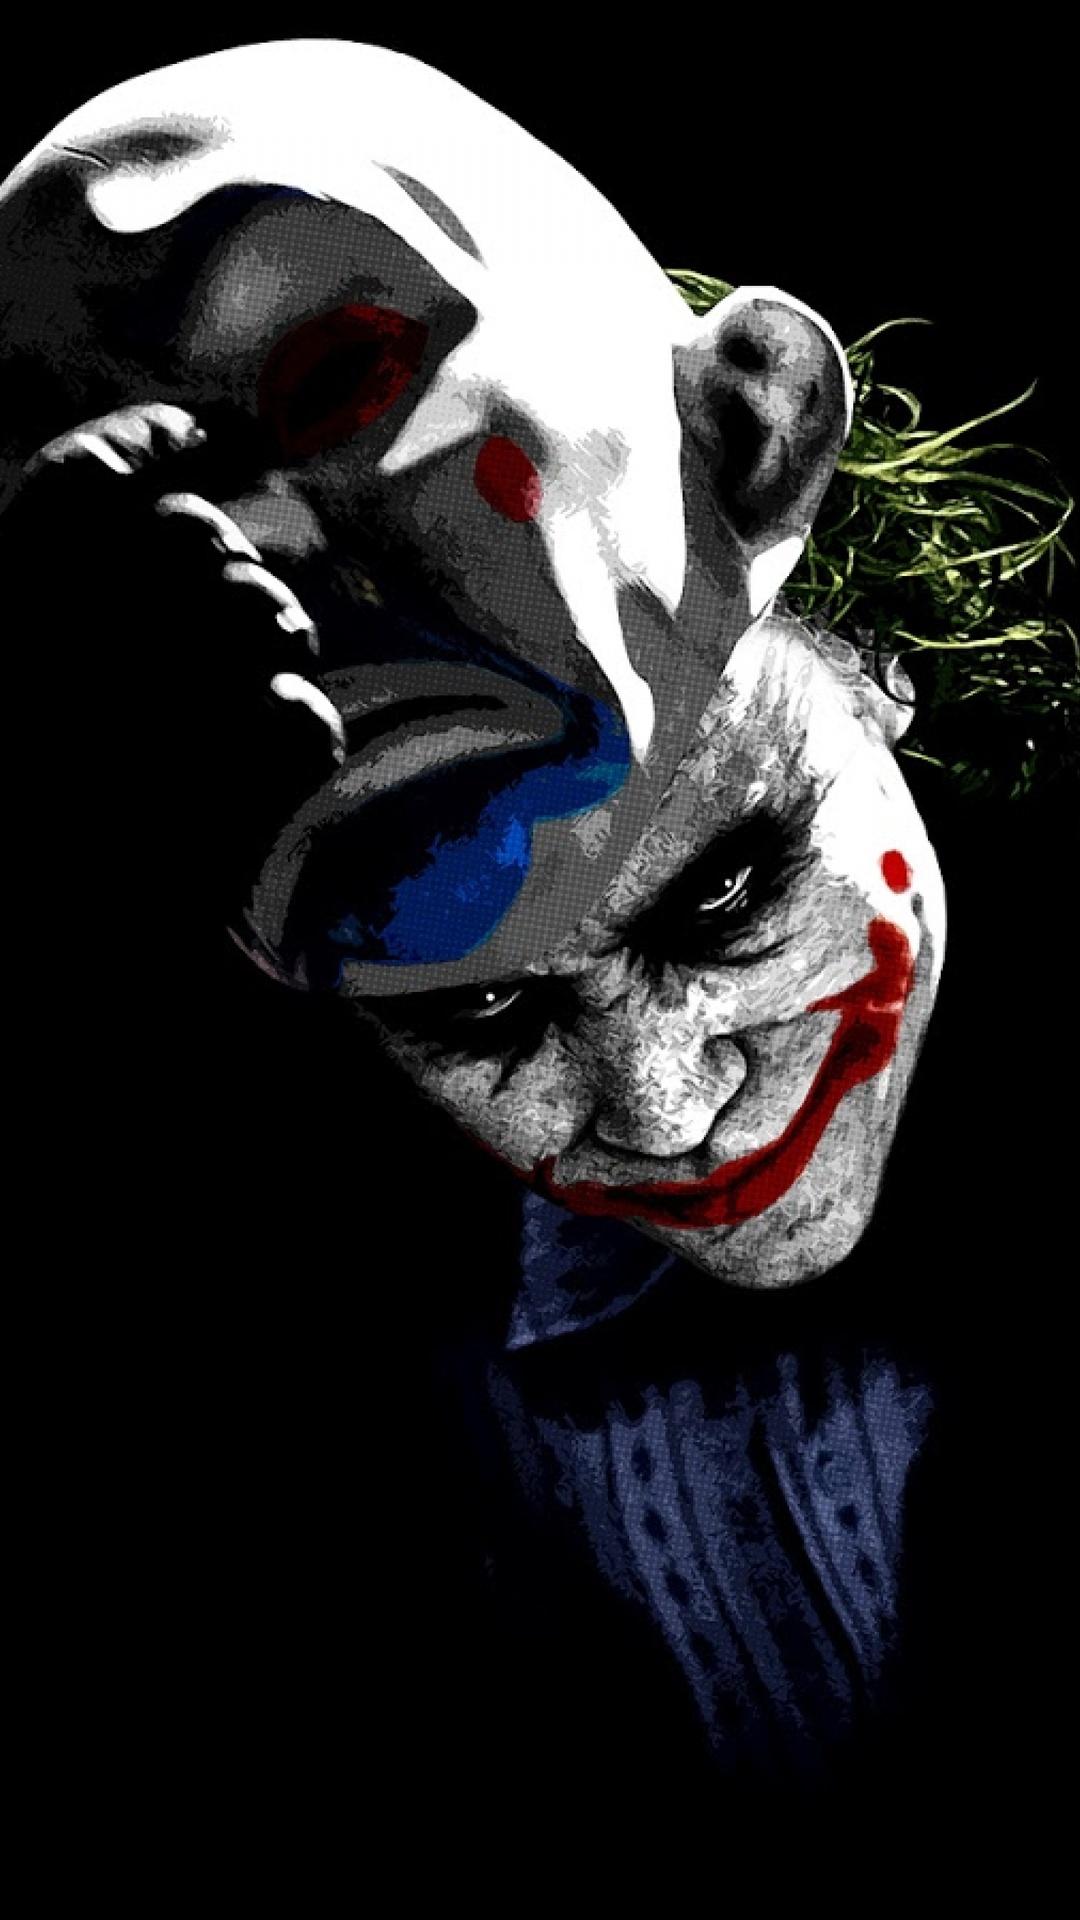 The Joker Painting 4k Hd Desktop Wallpaper For 4k Ultra Hd Tv Wide Ultra Widescreen Displays 15 Phone Wallpaper